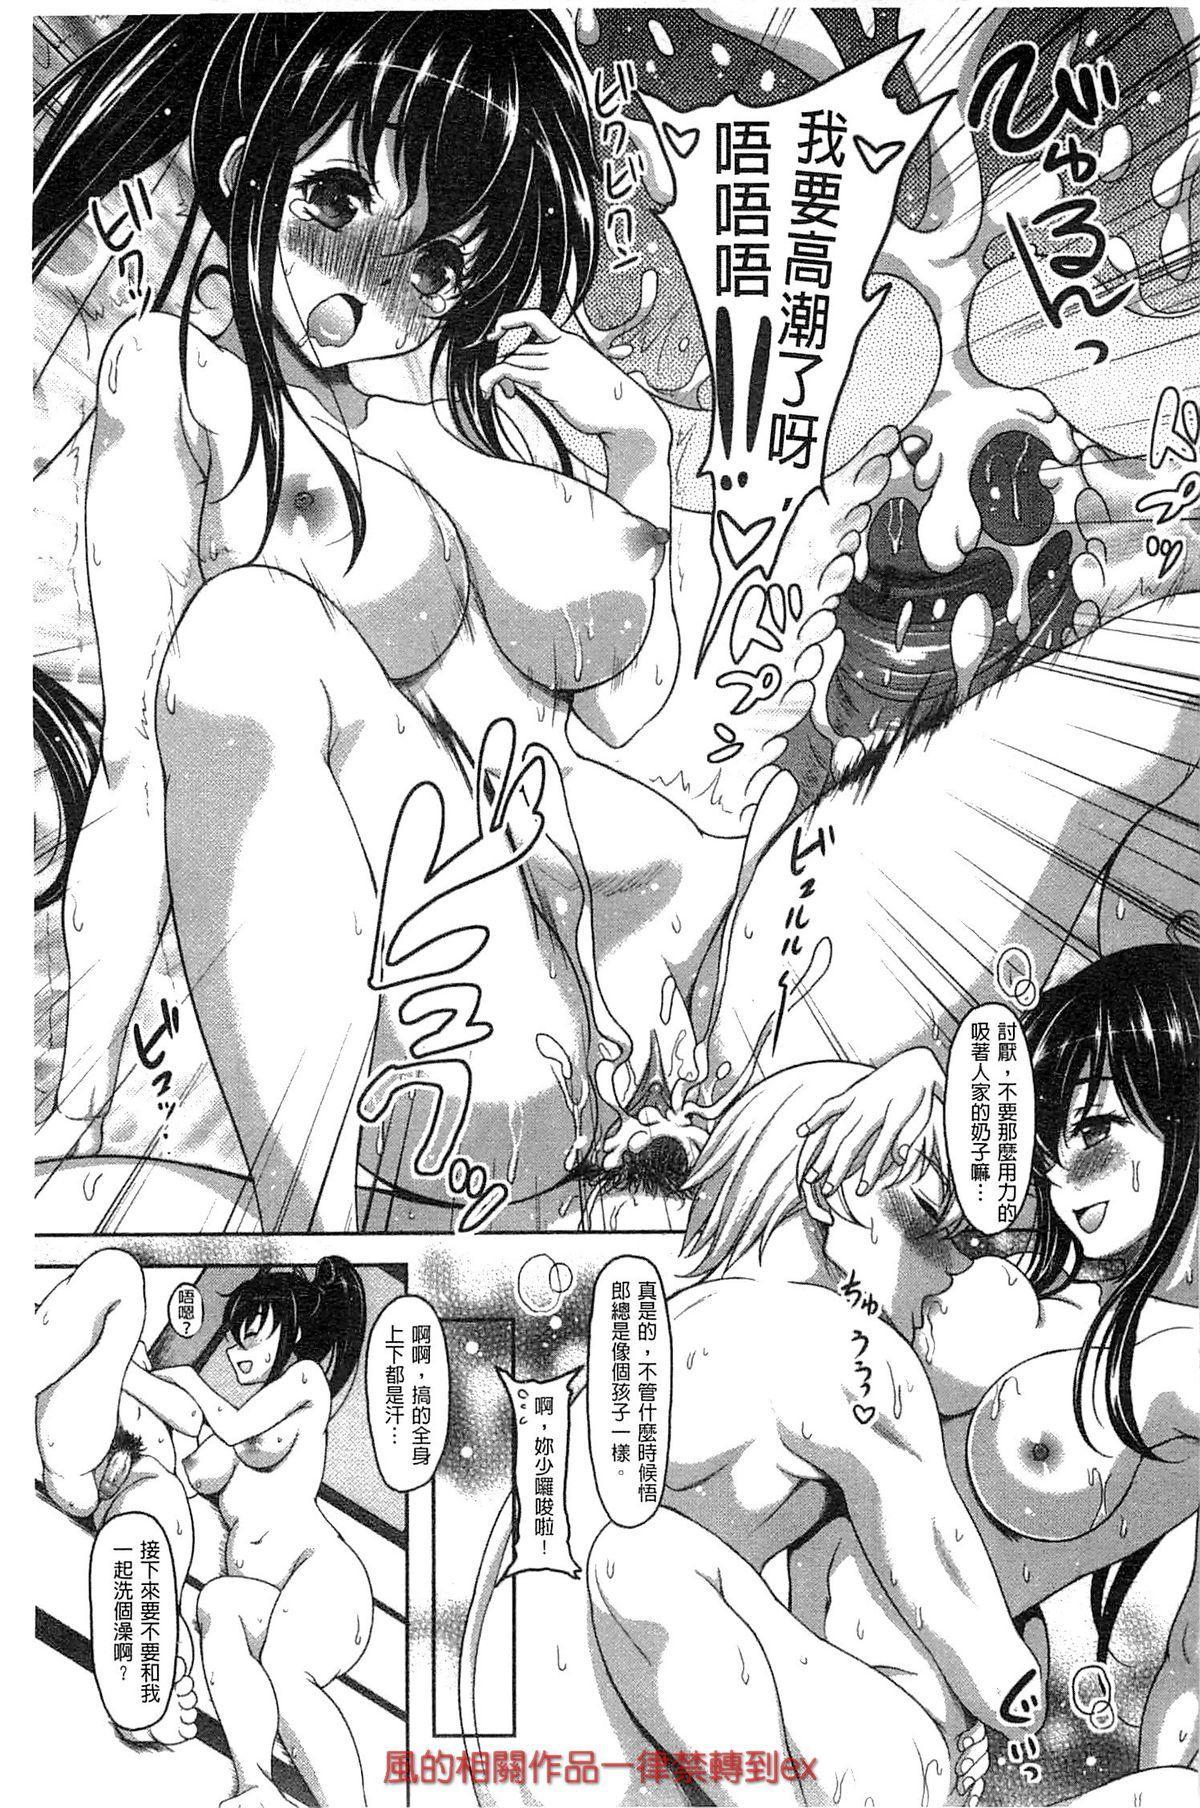 Hajimete nan da kara 28